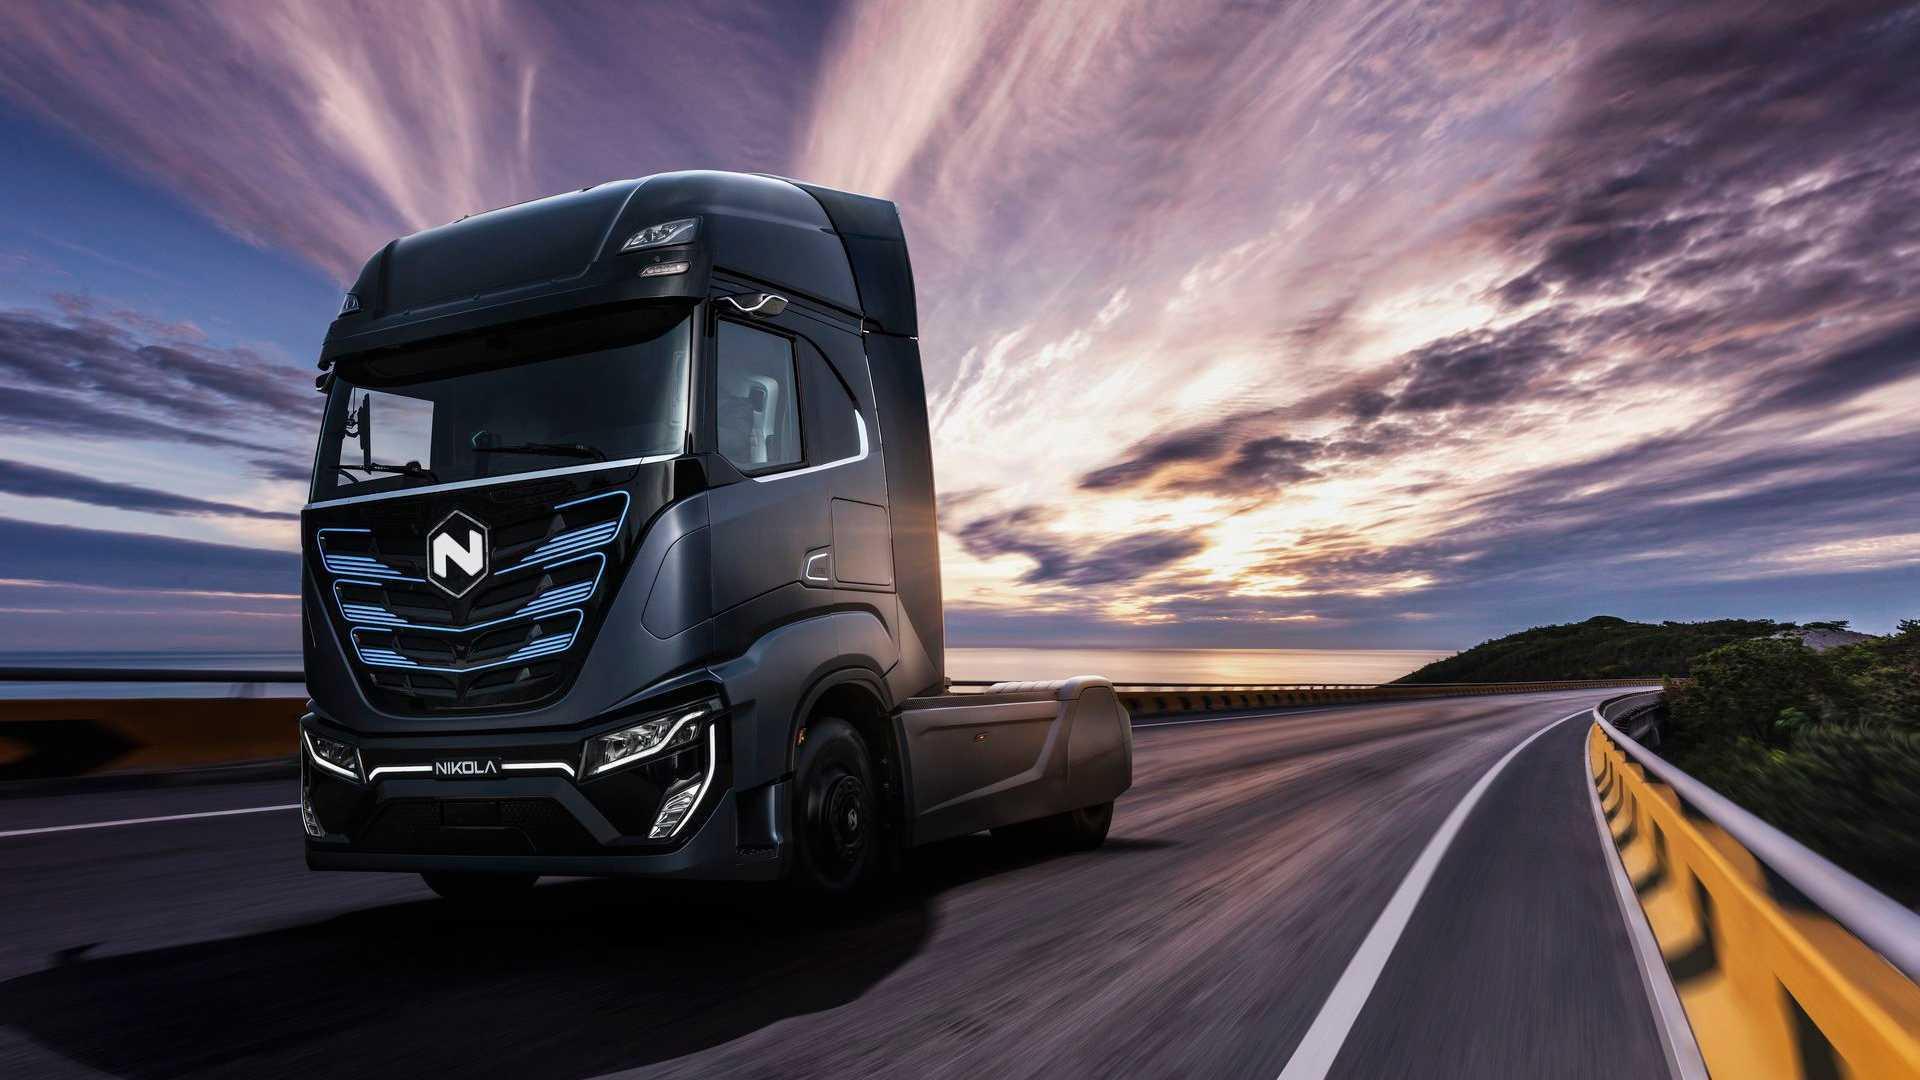 All-electric Nikola Tre HGV revealed